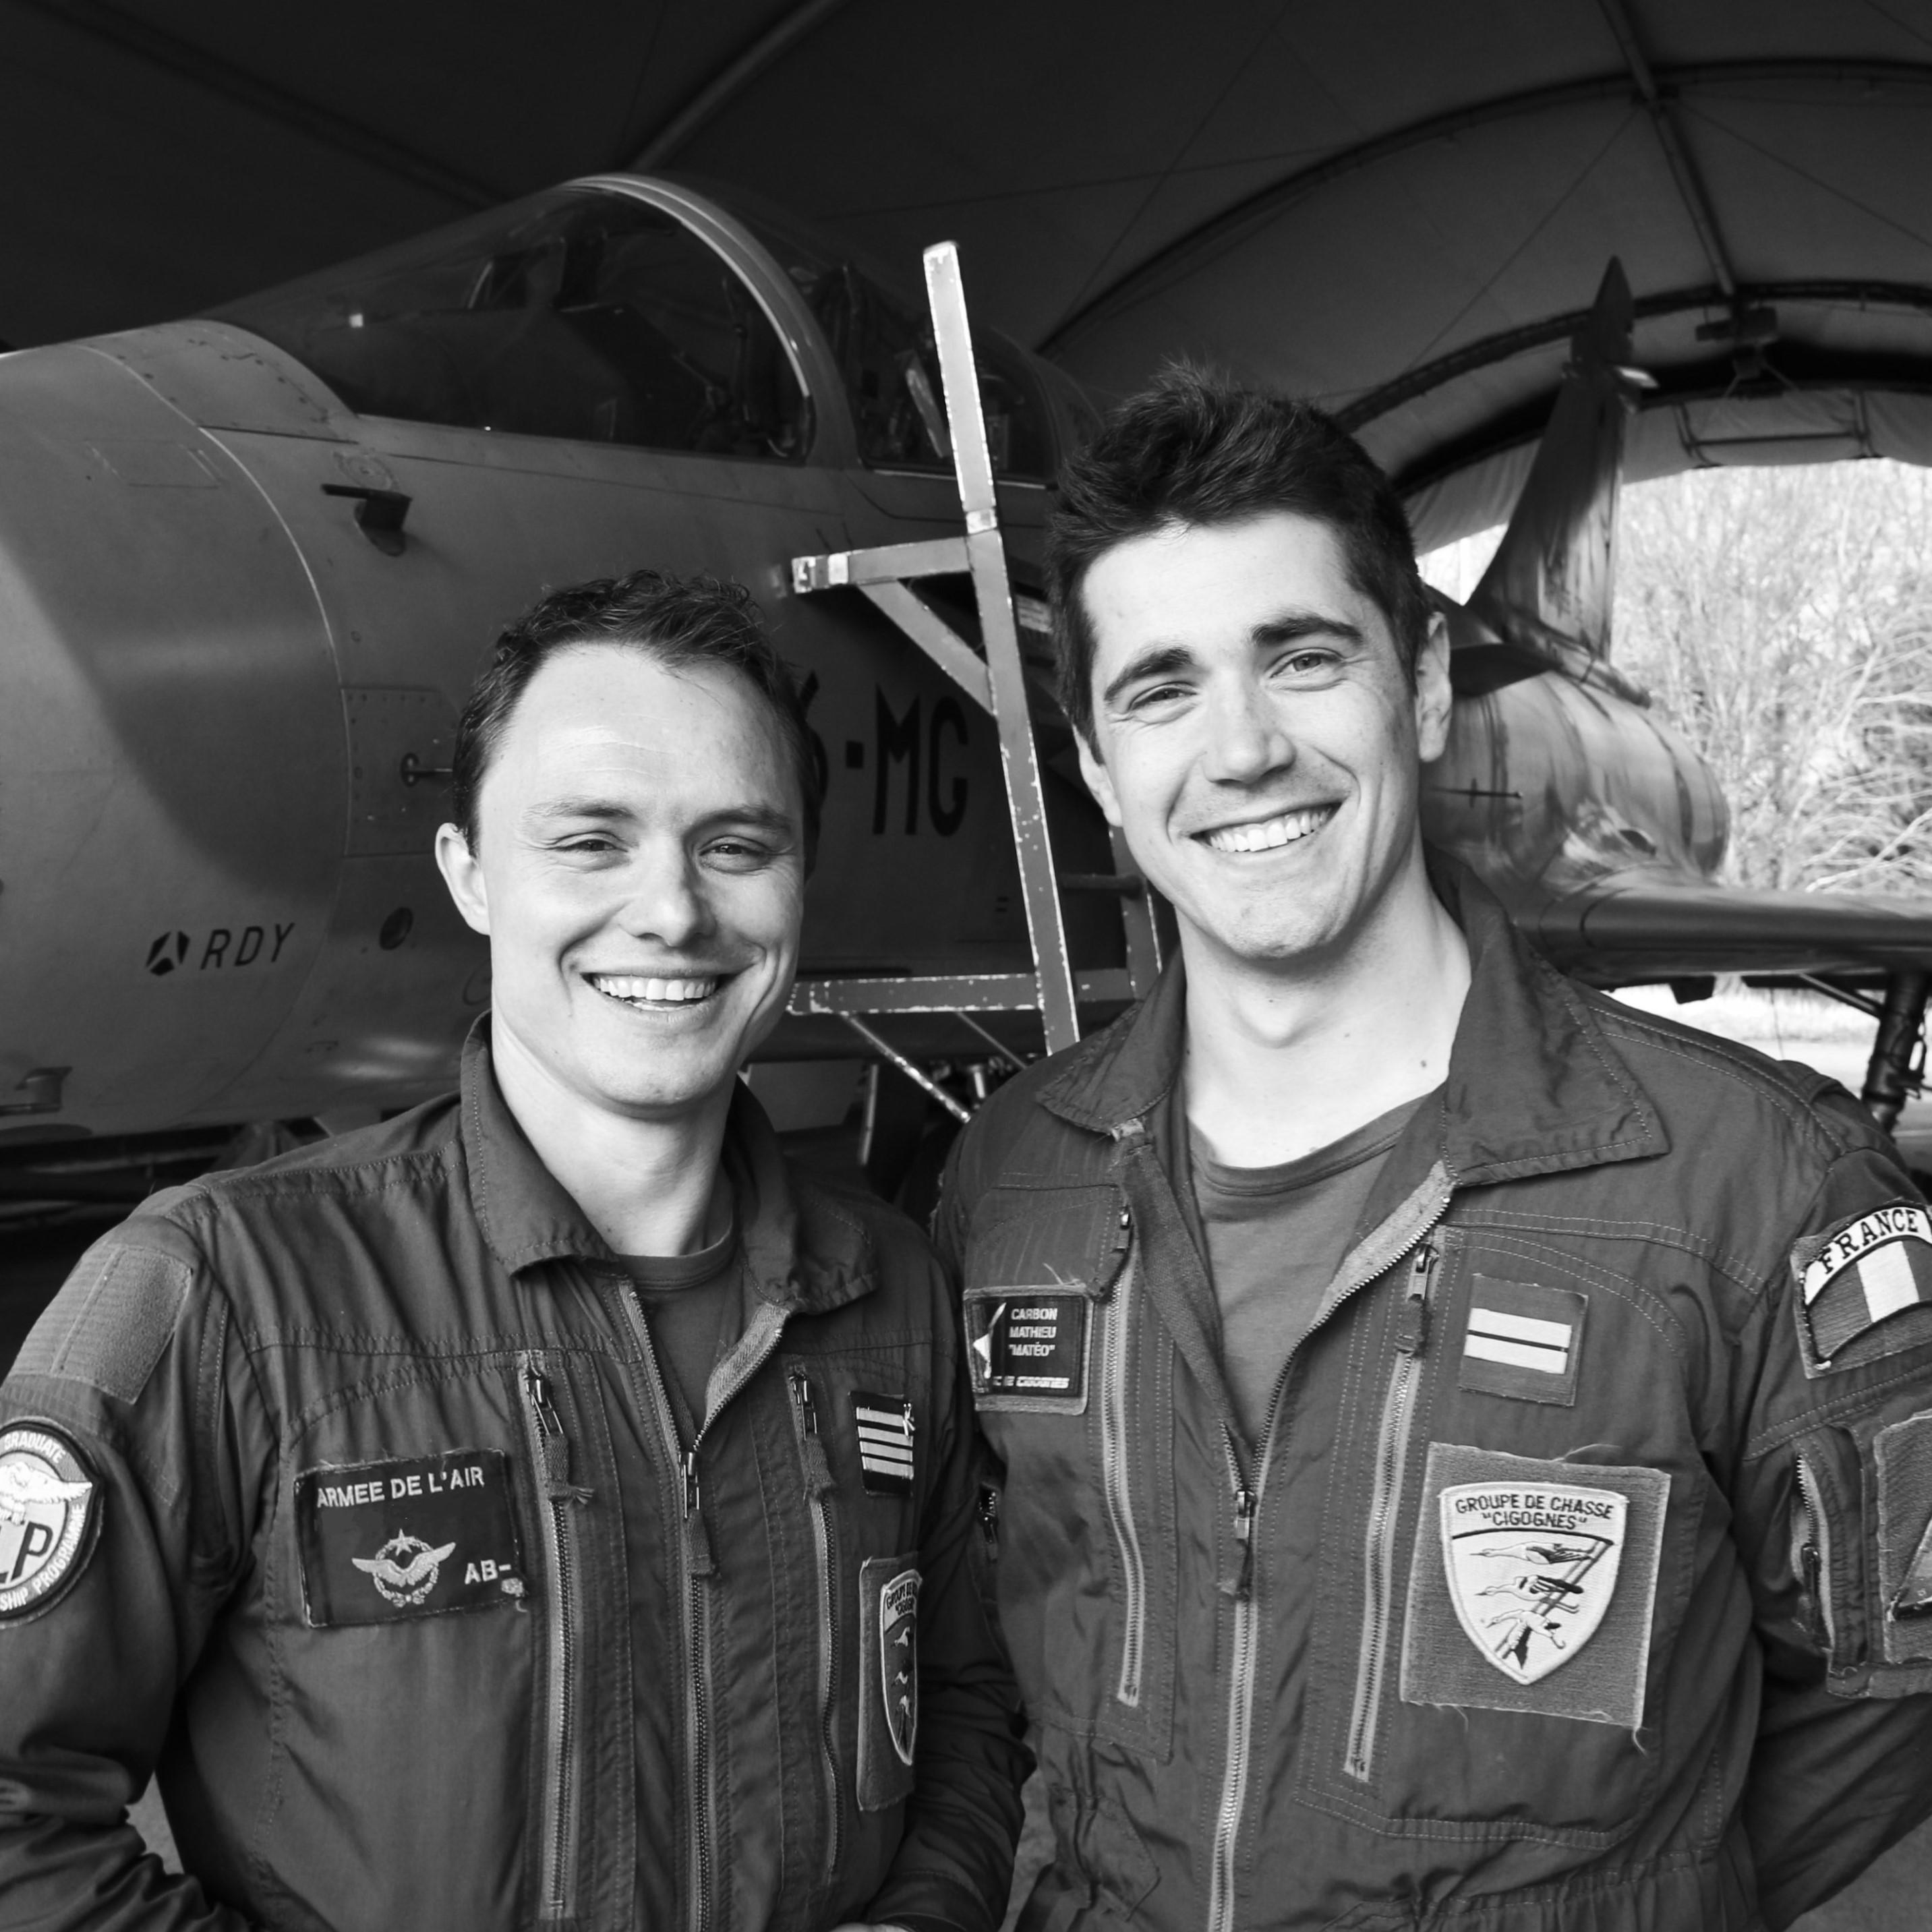 Major Peck, Test Pilot, Fighter Pilot, Engineer